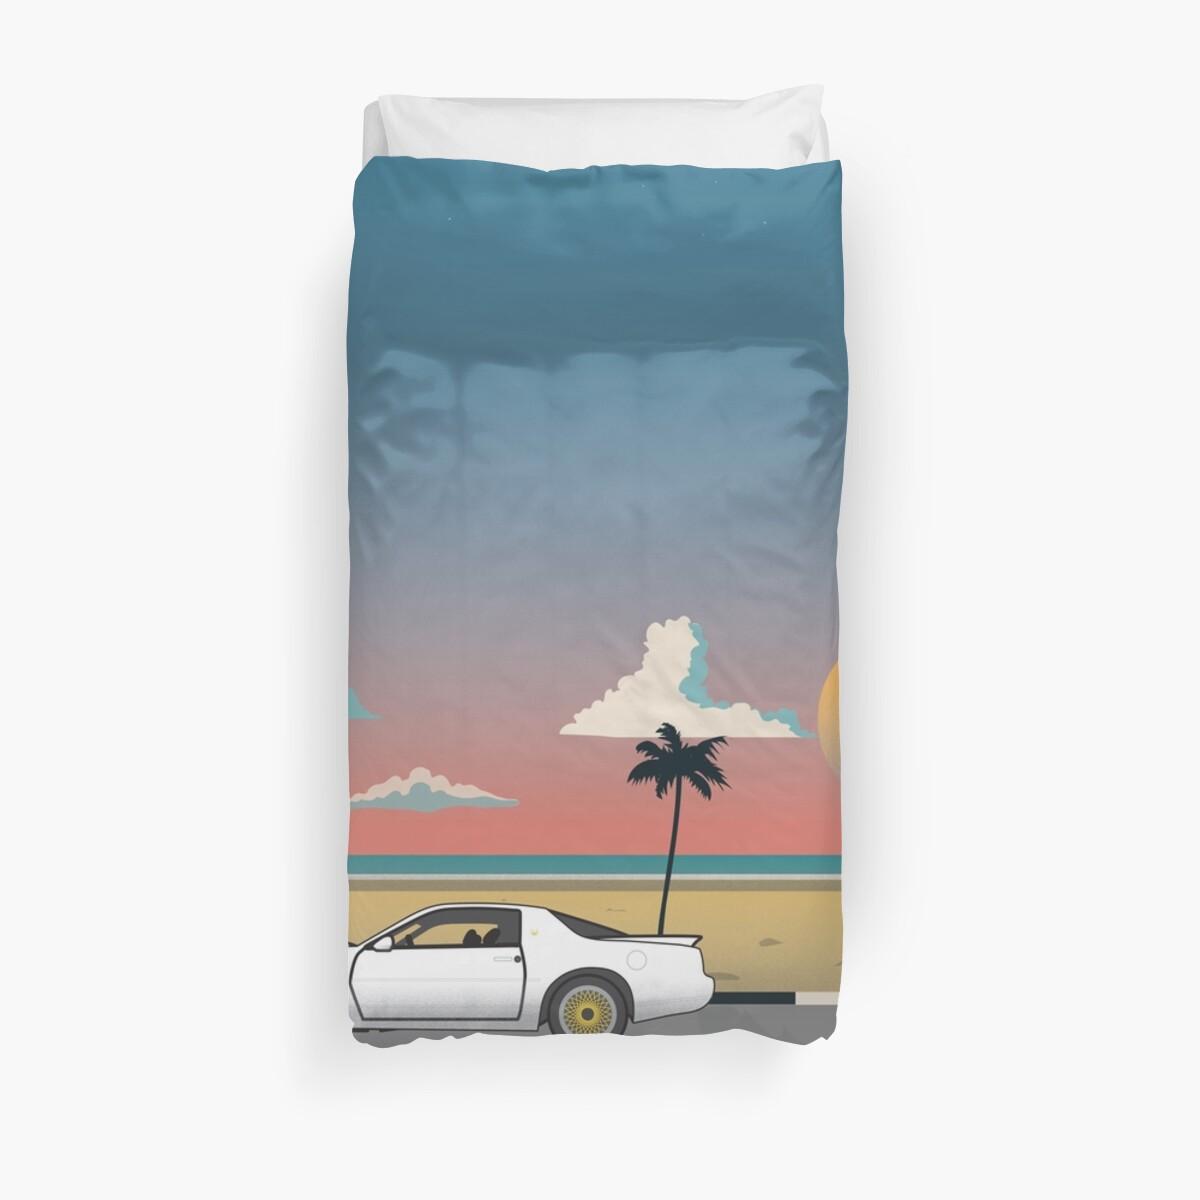 1988 Pontiac Transam Gta Cruising By The Beach Duvet Covers Trans Am Matthew Perrin